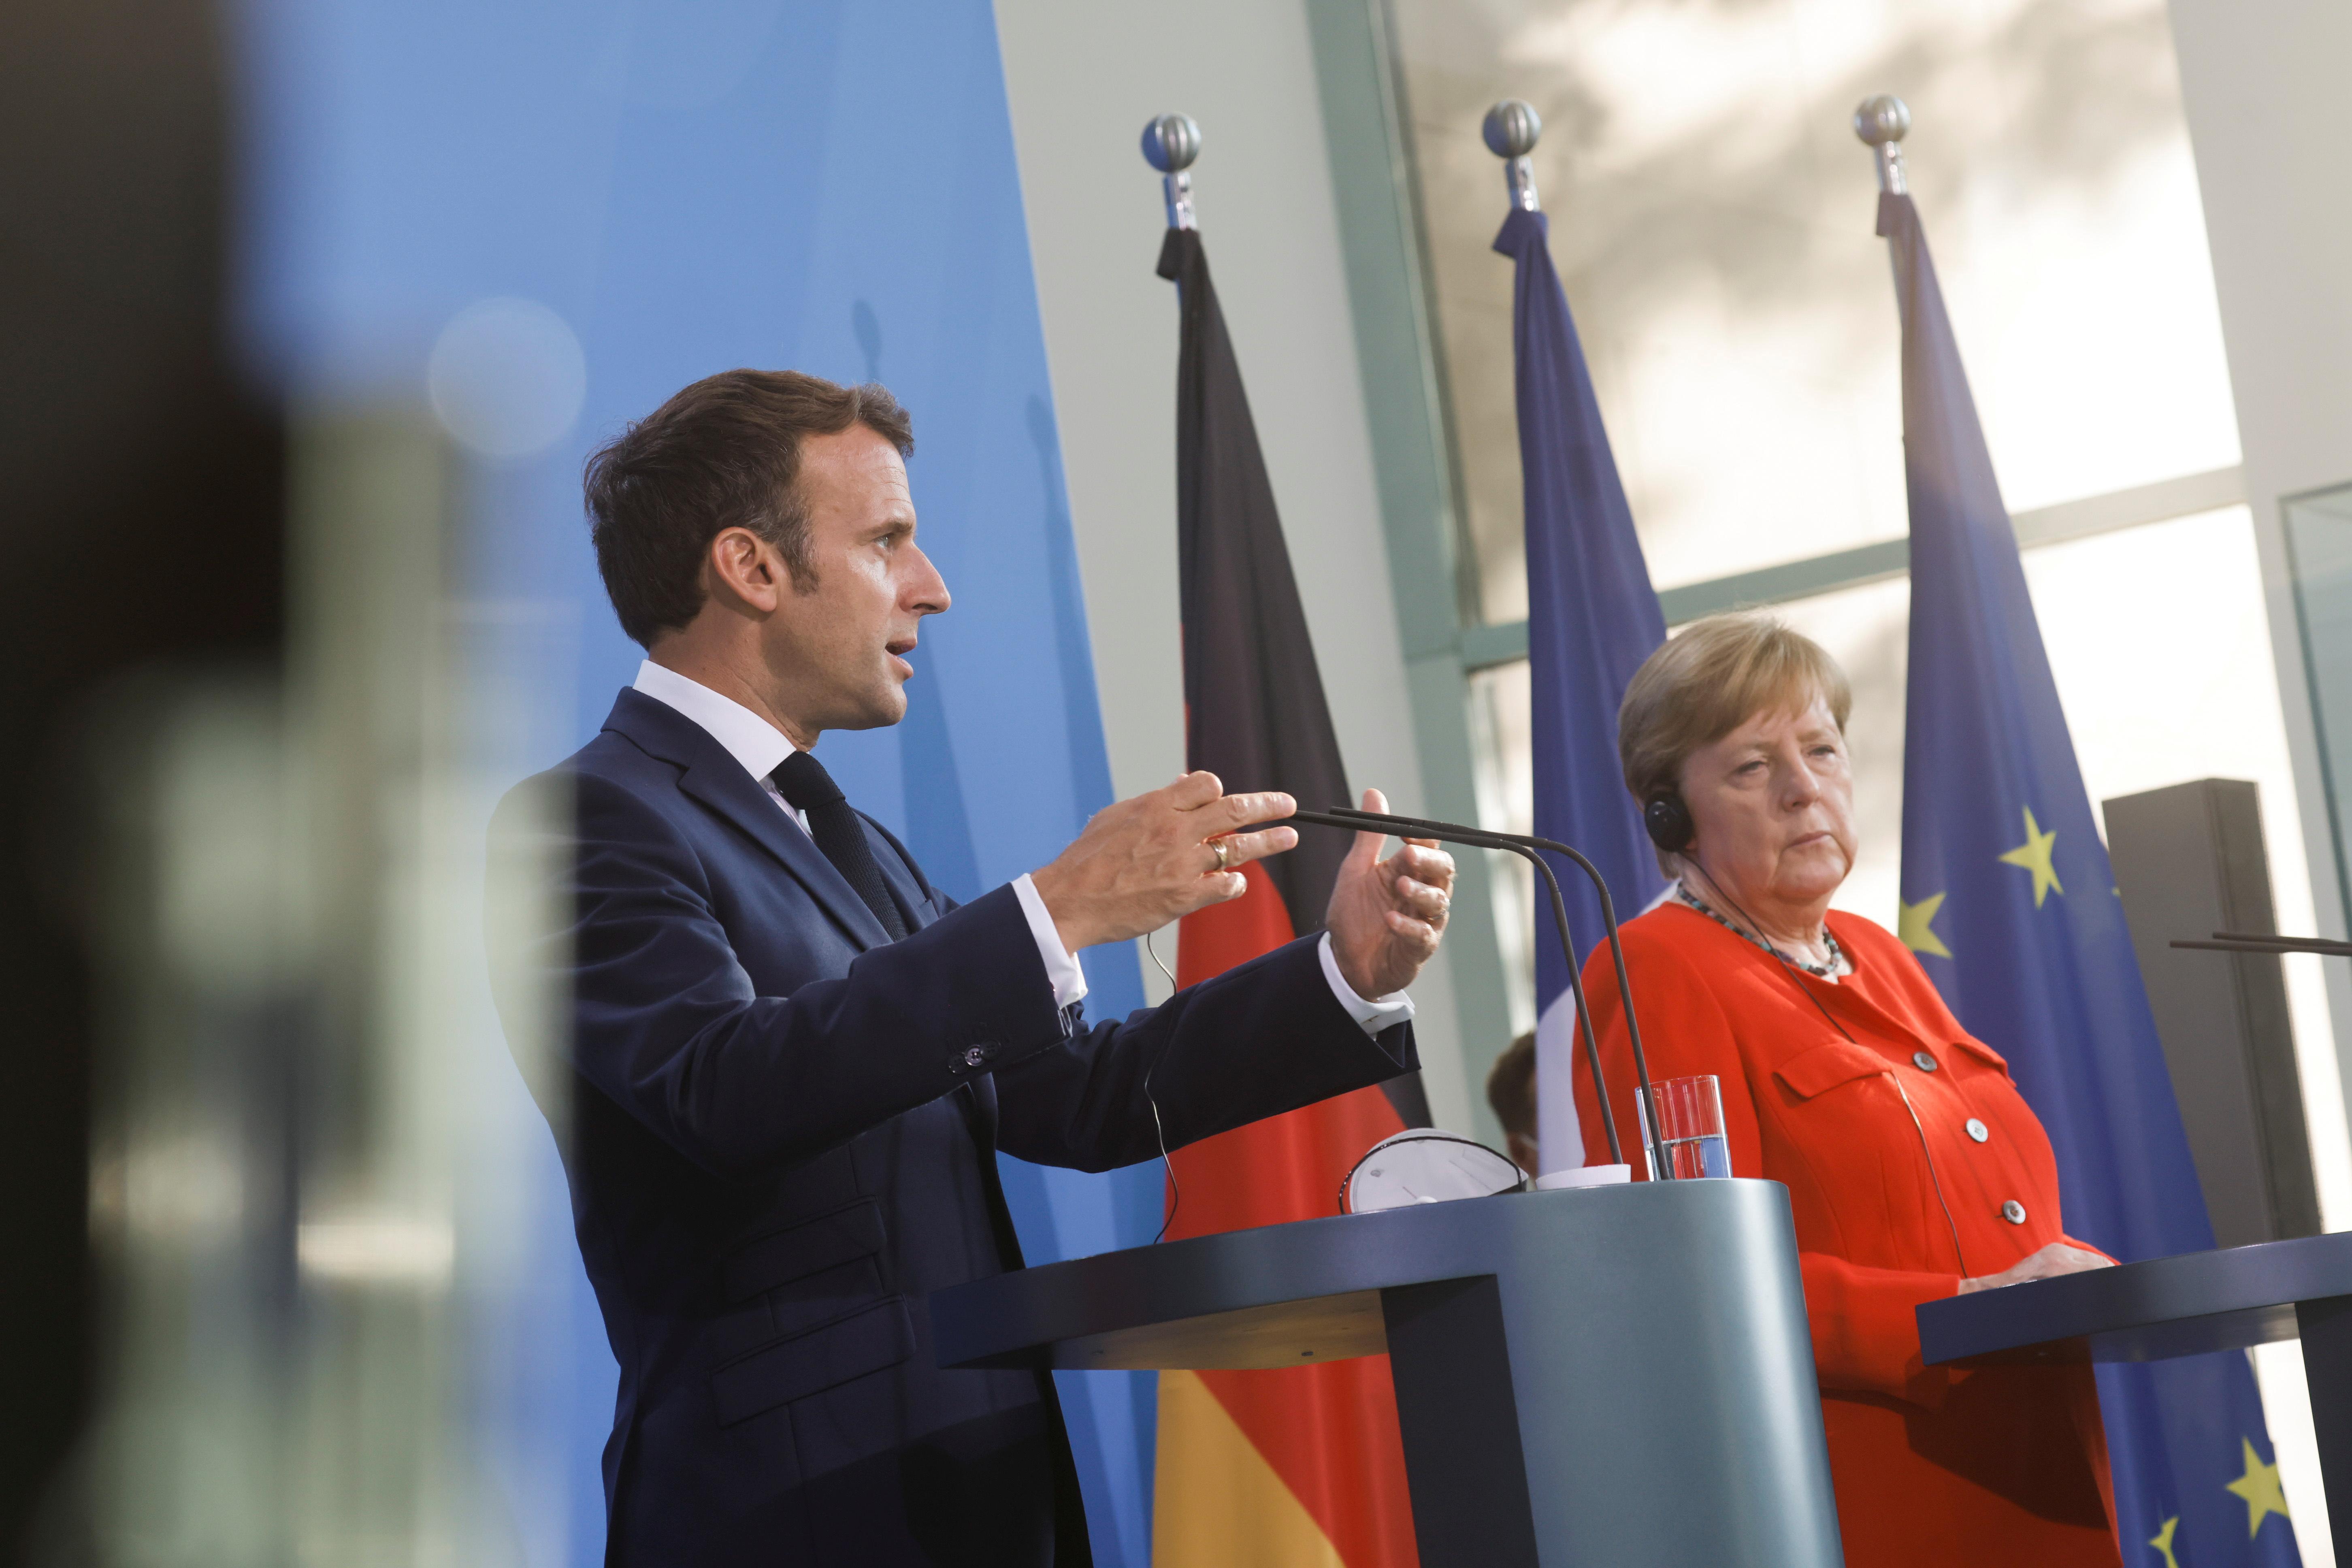 French President Emmanuel Macron speaks as he and German Chancellor Angela Merkel give a news statement in Berlin, Germany, June 18, 2021. REUTERS/Axel Schmidt/Pool